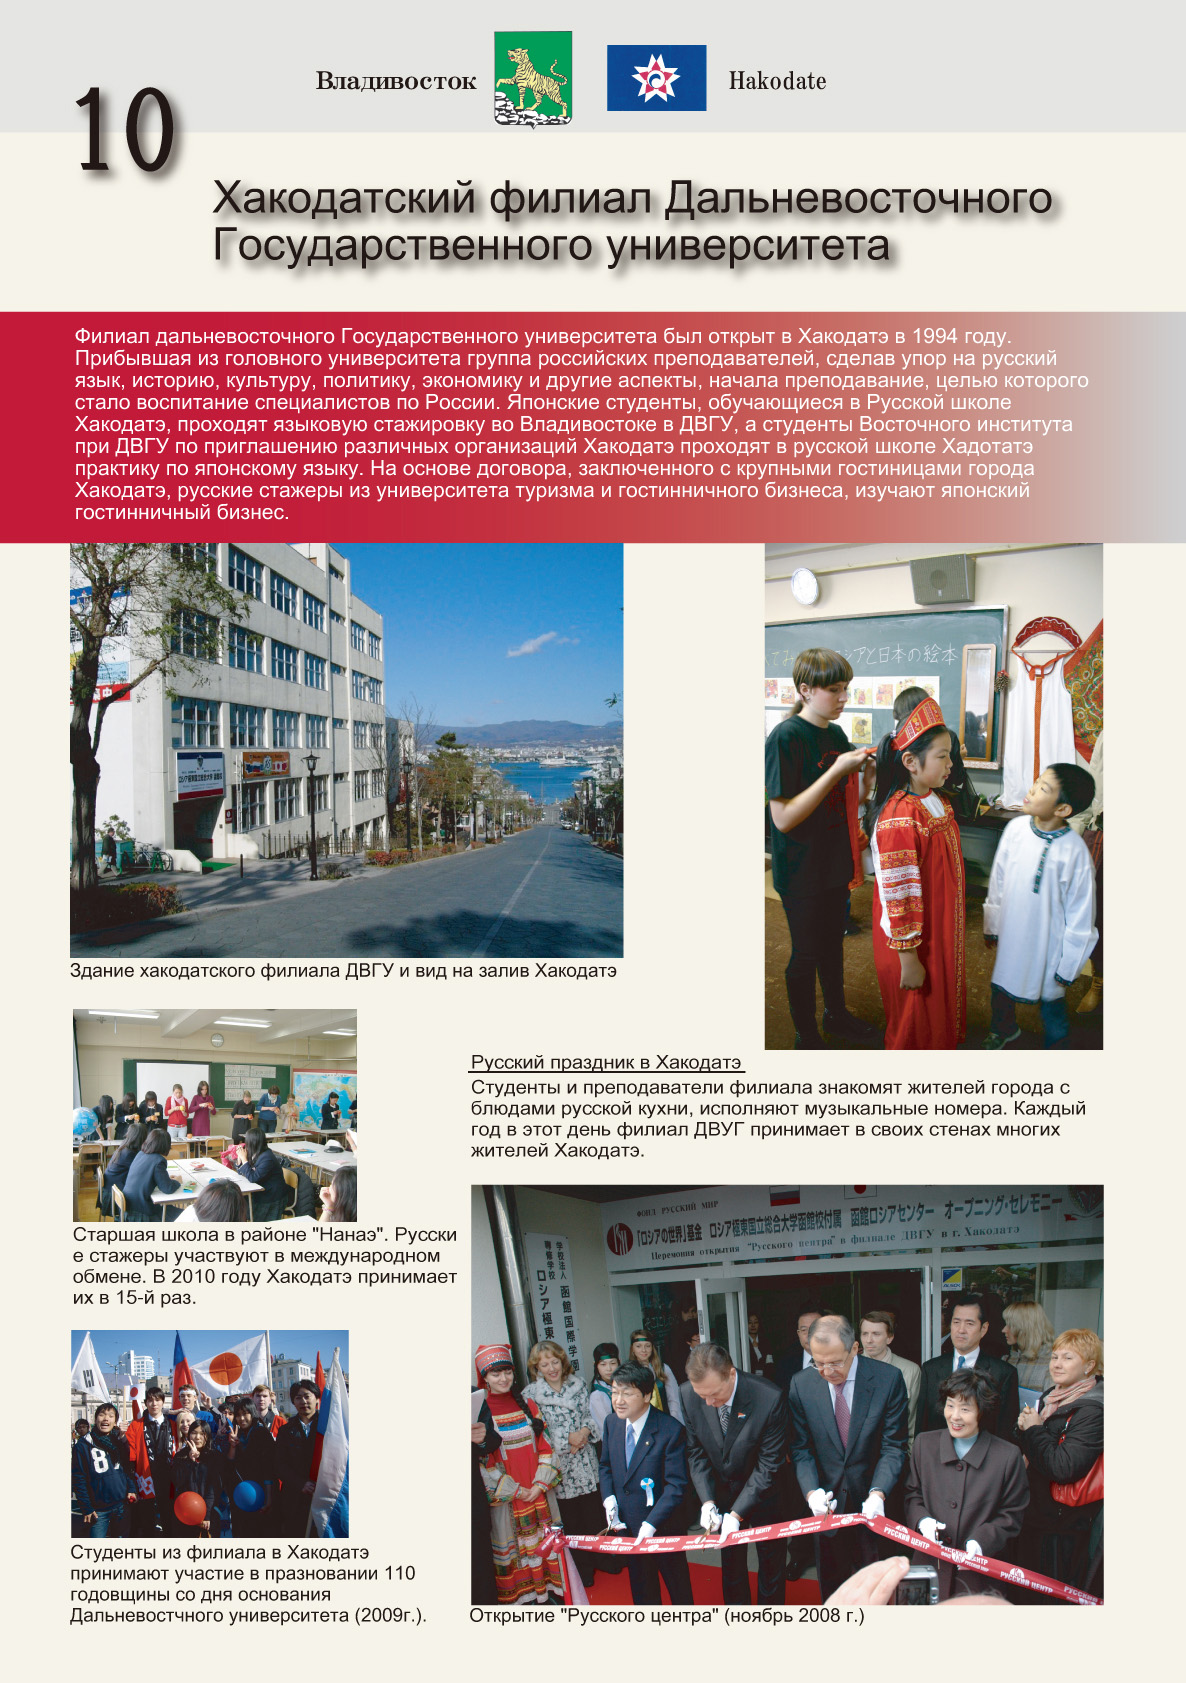 http://hakodate-russia.com/main/image/2011-panel10.jpg